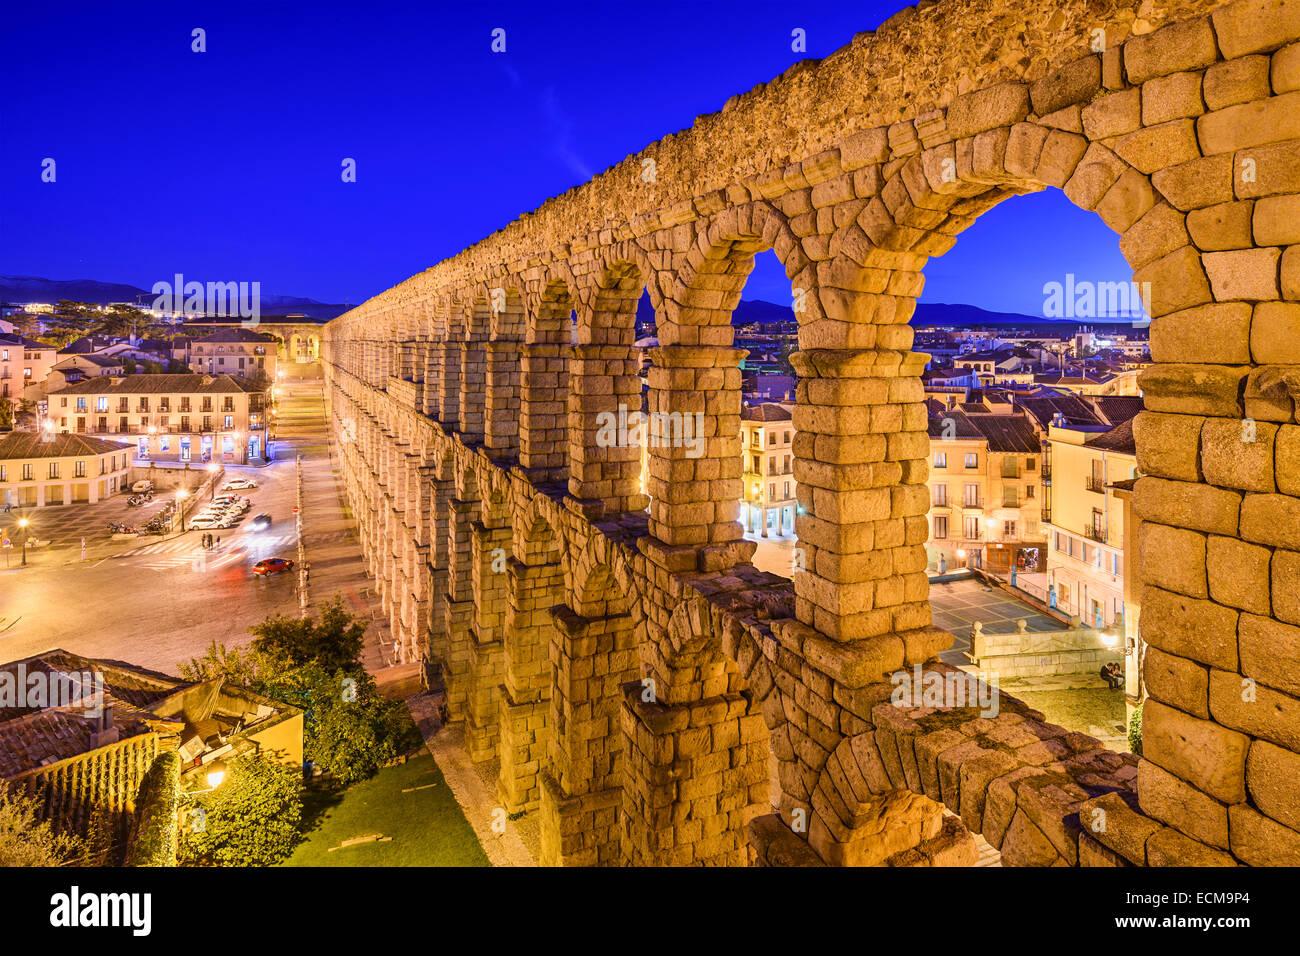 Segovia, Spain at the ancient Roman aqueduct and Azoguejo Square. - Stock Image